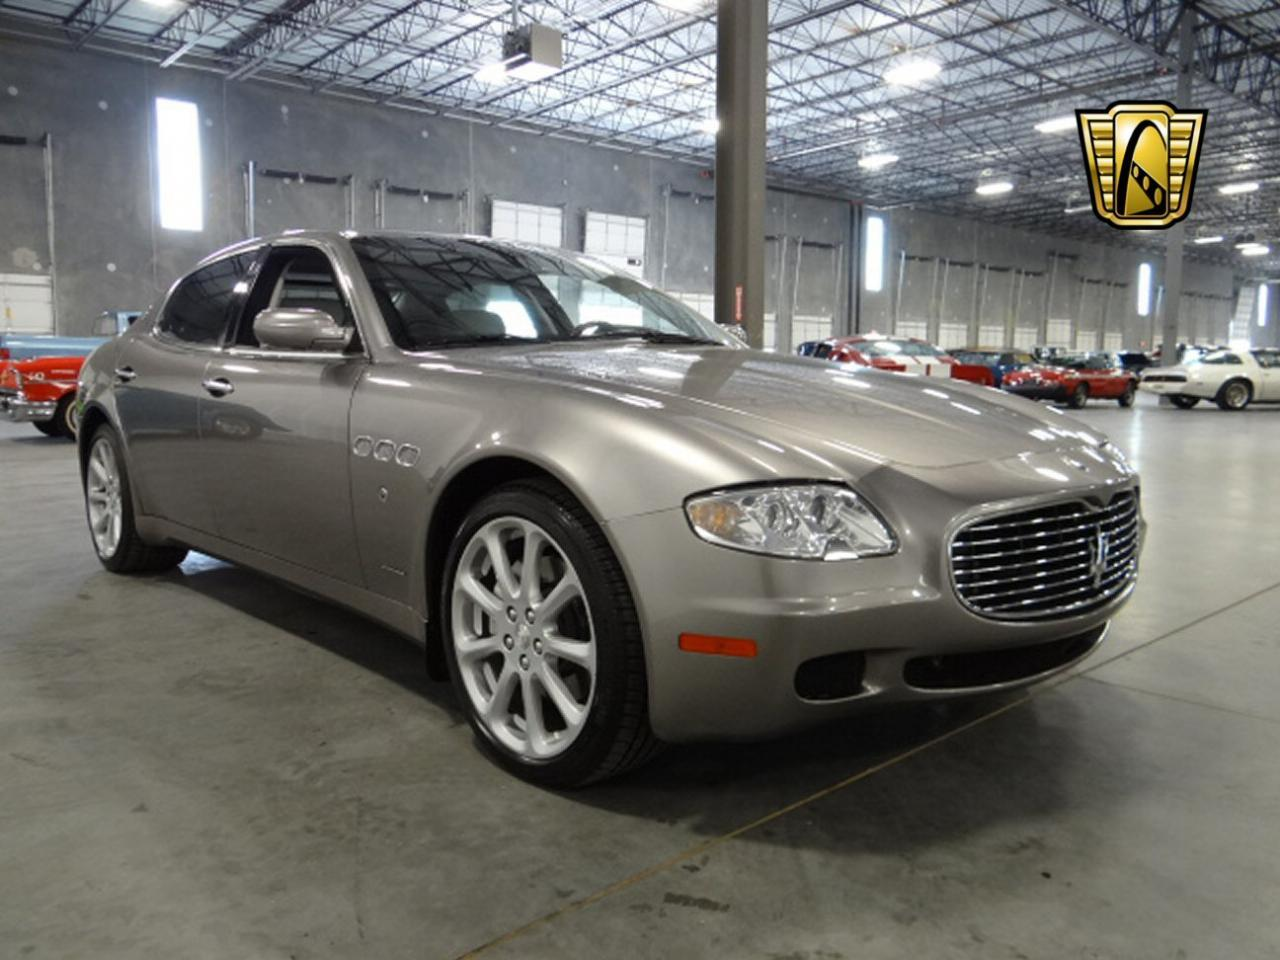 2007 Maserati Quattroporte for Sale | ClassicCars.com | CC ...